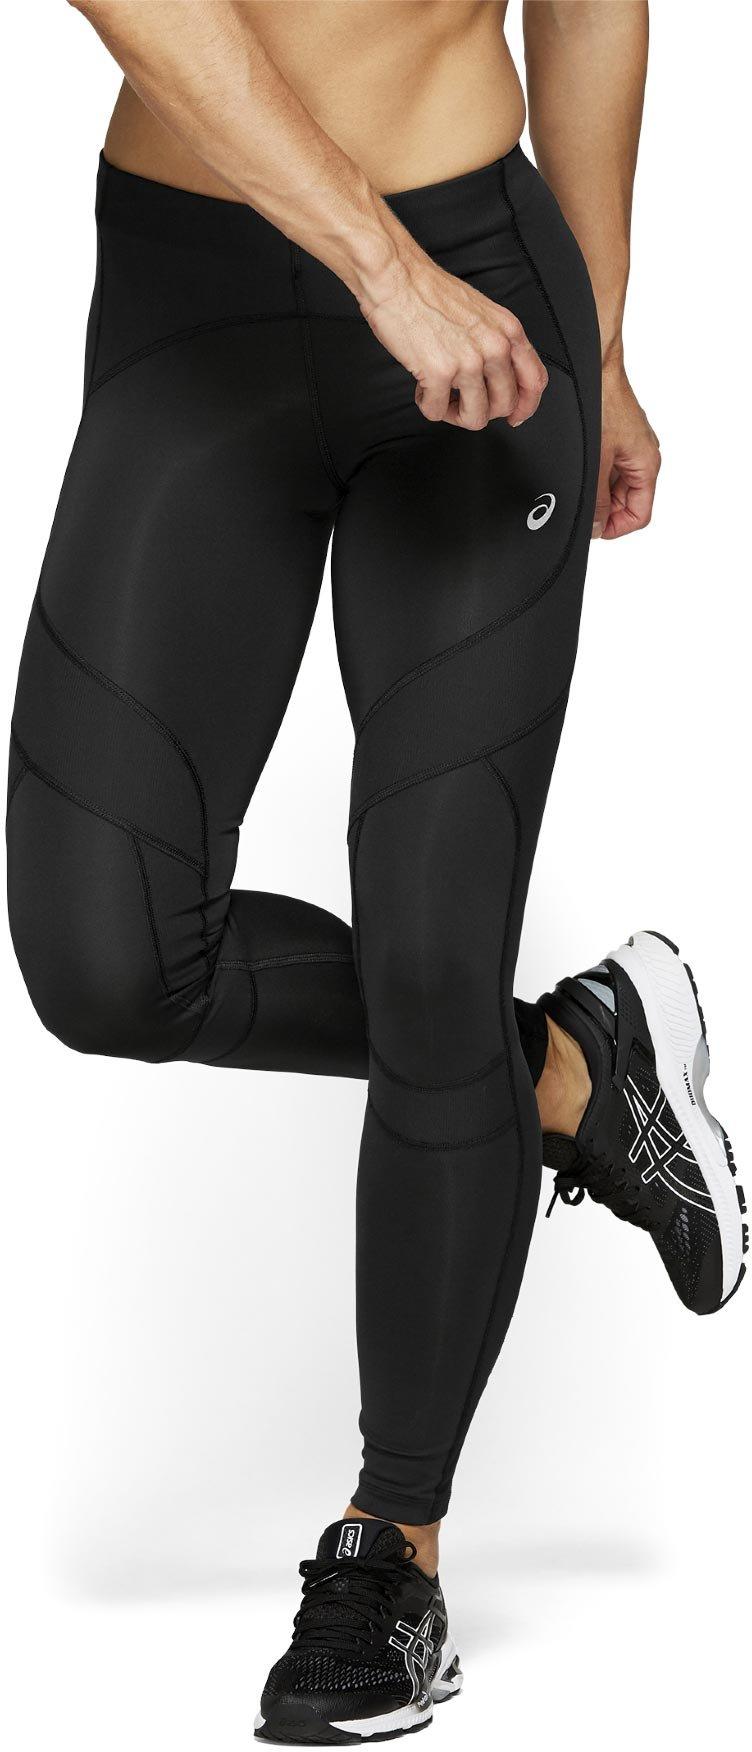 Asics Leg Balance Tight 2 M